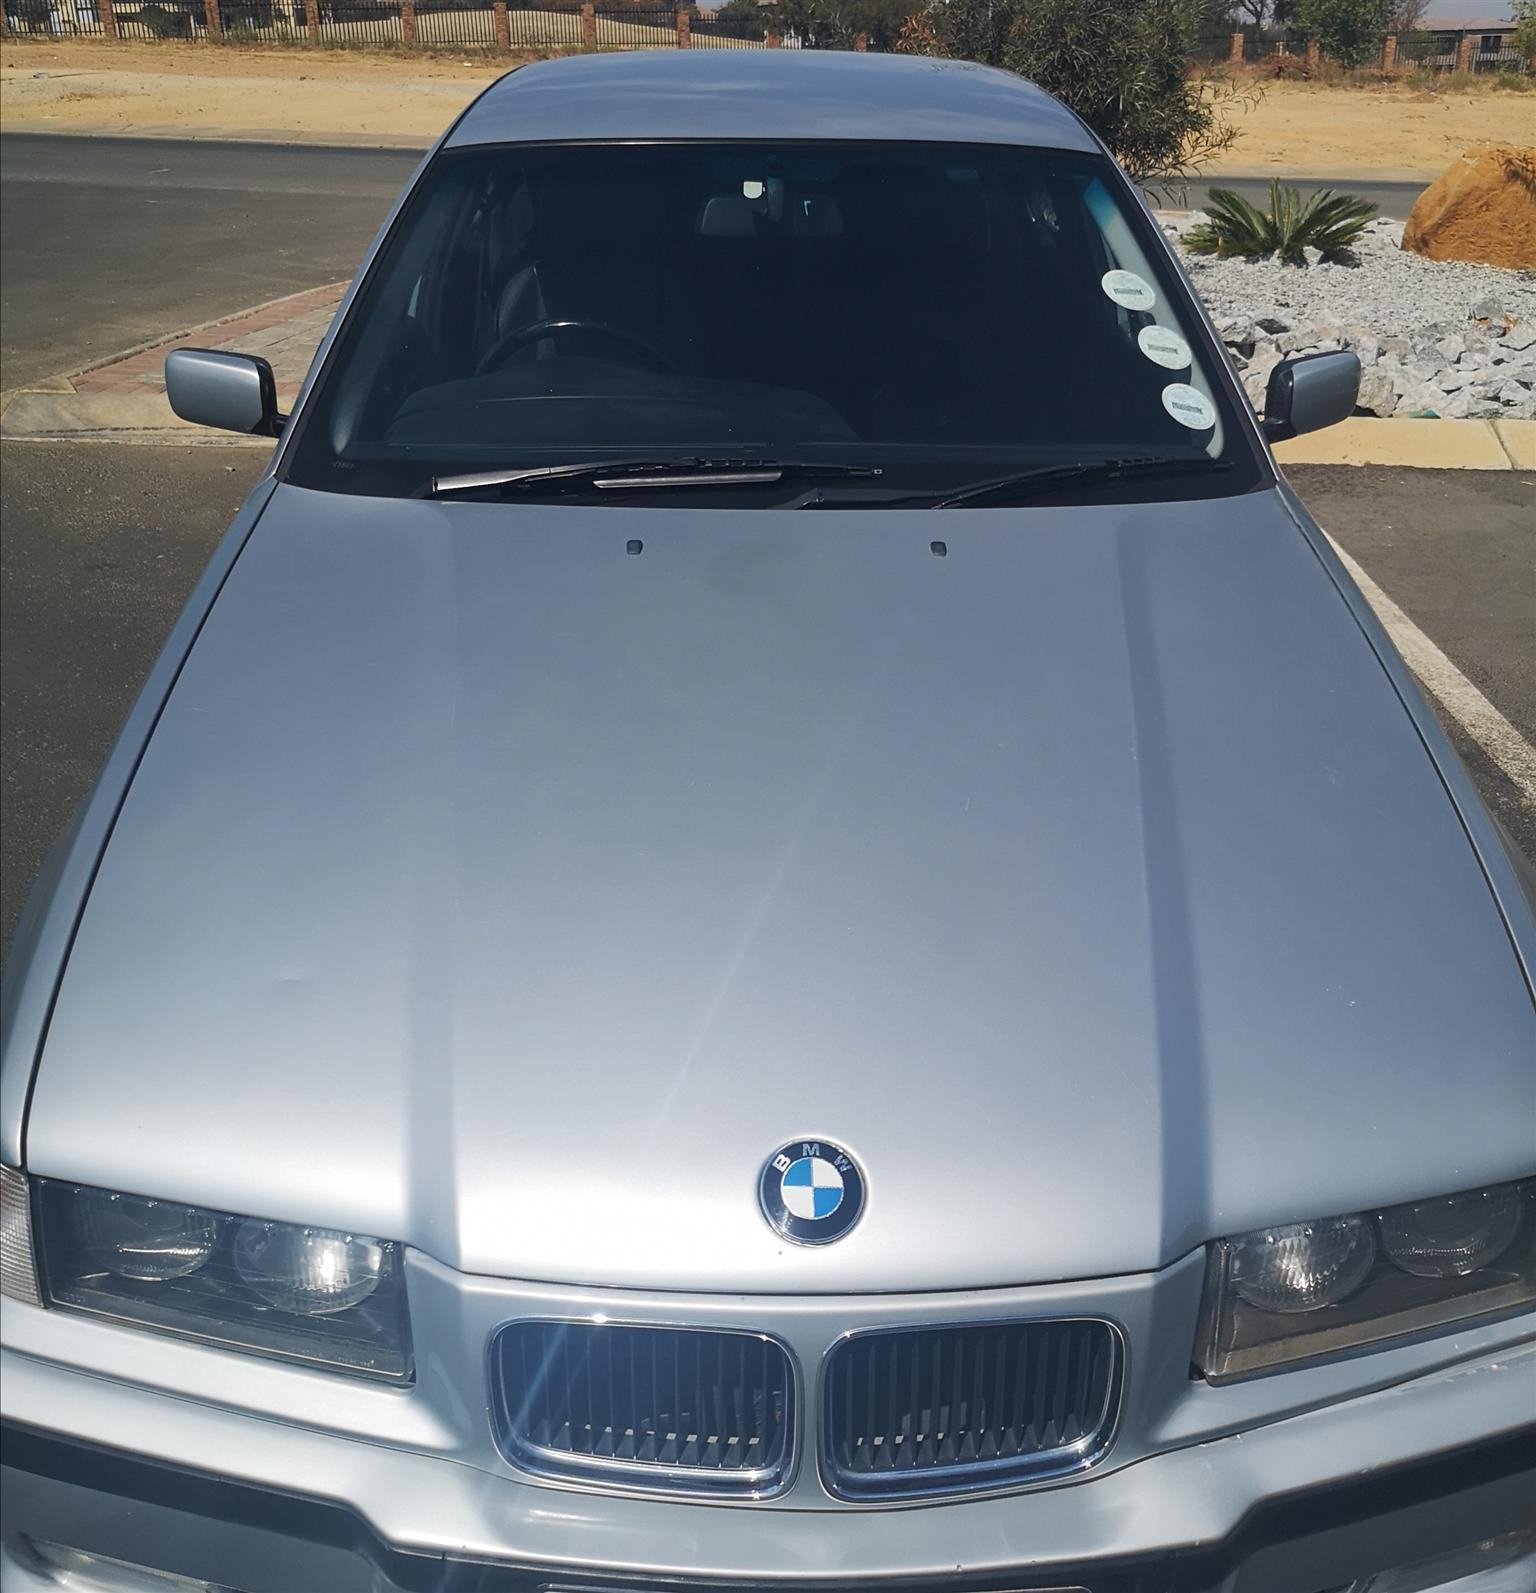 1997 BMW 3 Series sedan 320i SPORT LINE LAUNCH EDITION A/T (G20)